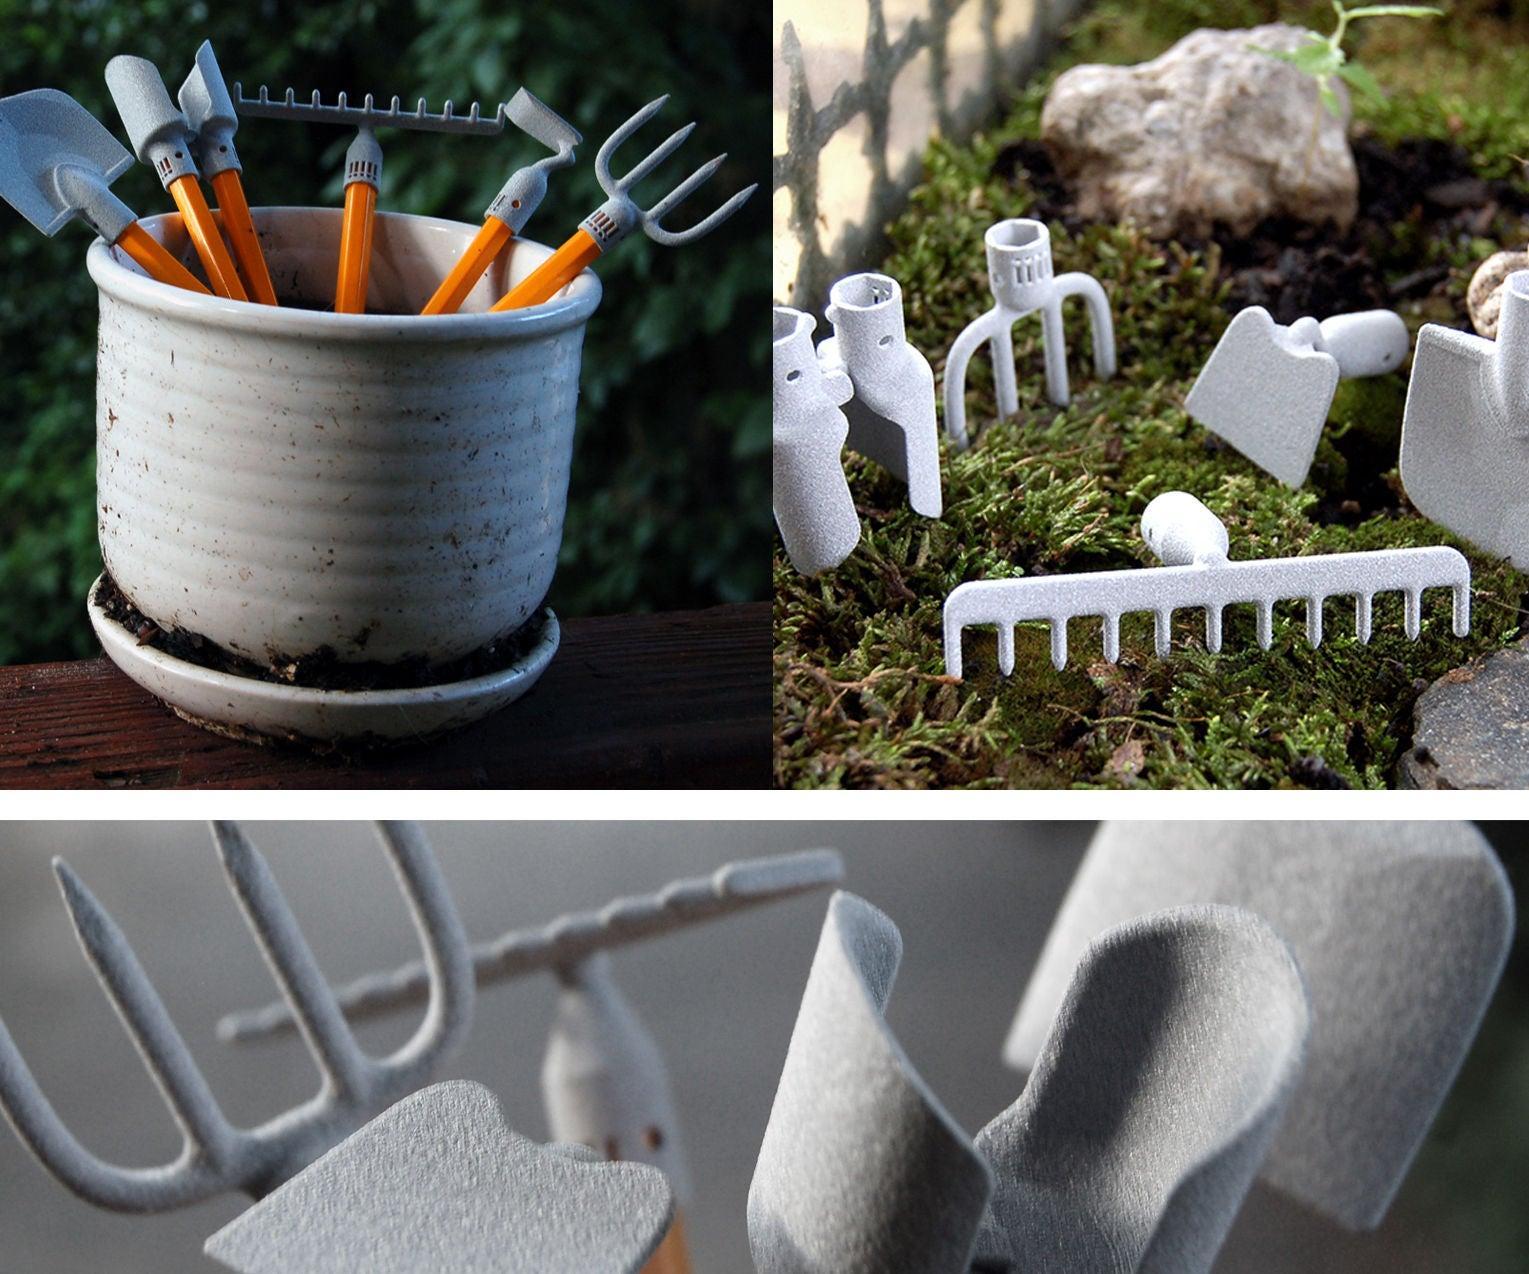 How to Make a Set of Desktop Gardening Tools